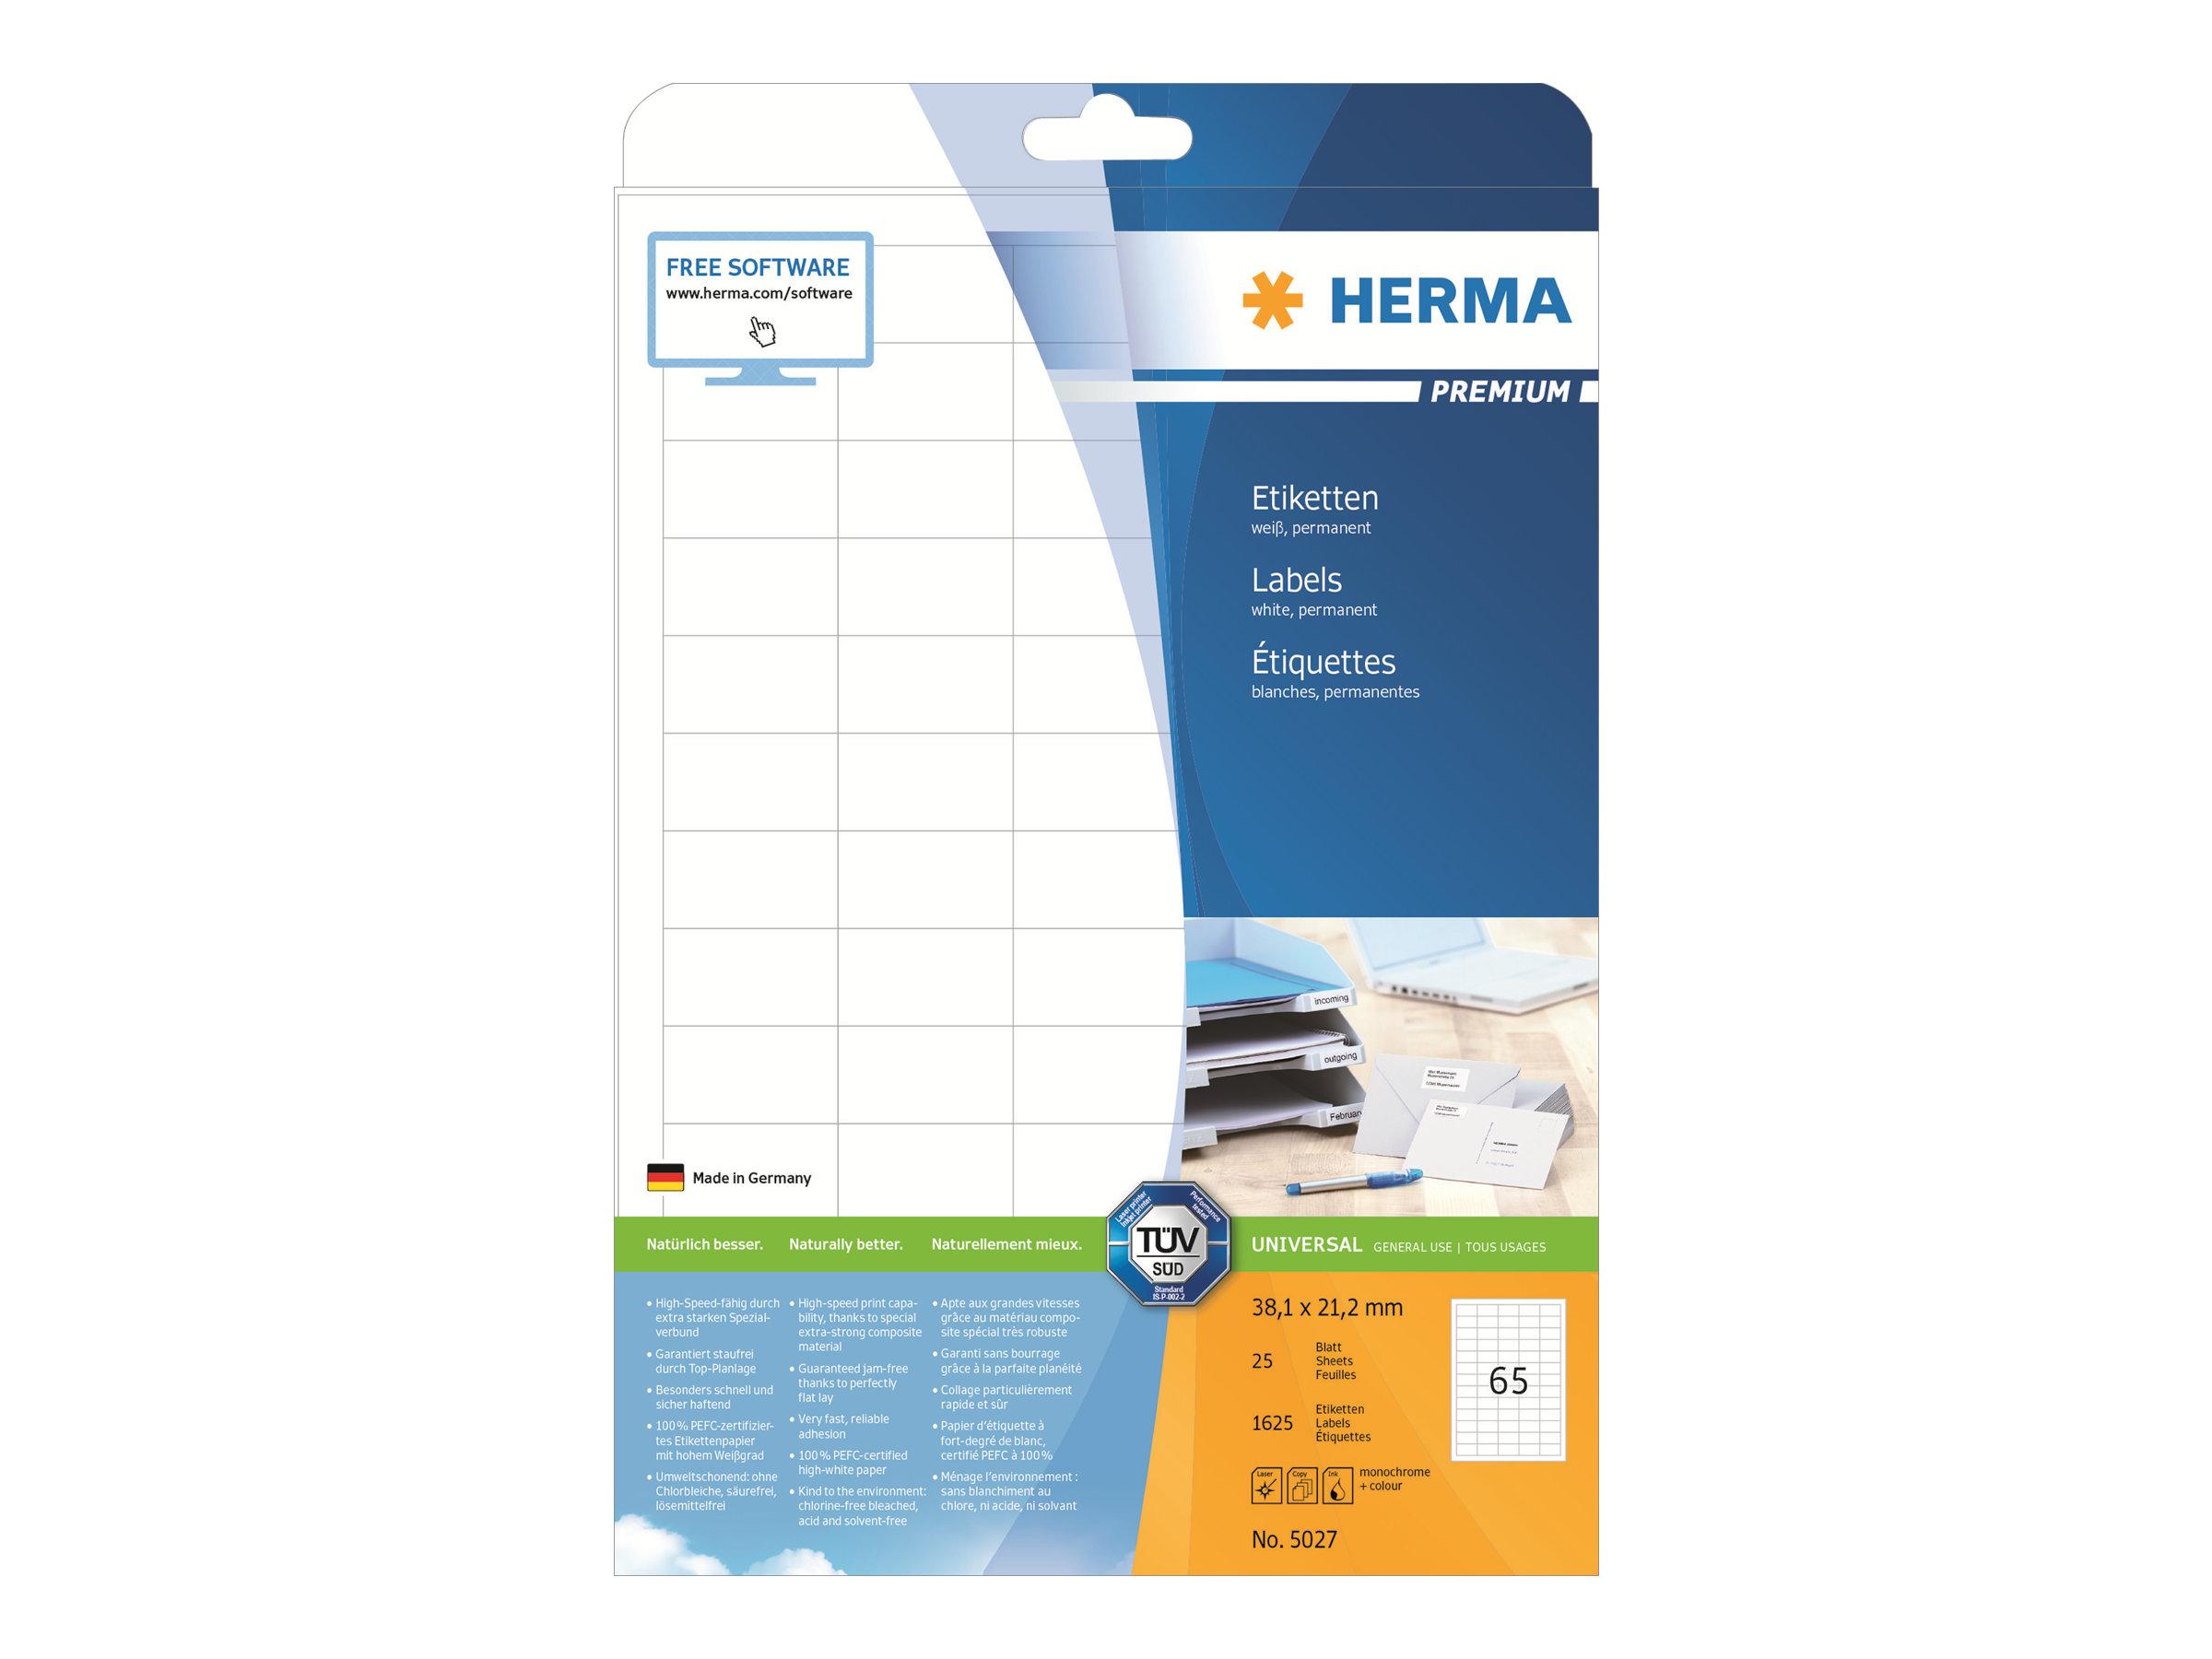 HERMA Special - Selbstklebend - weiß - 38.1 x 21.2 mm 1625 Stck. (25 Bogen x 65)